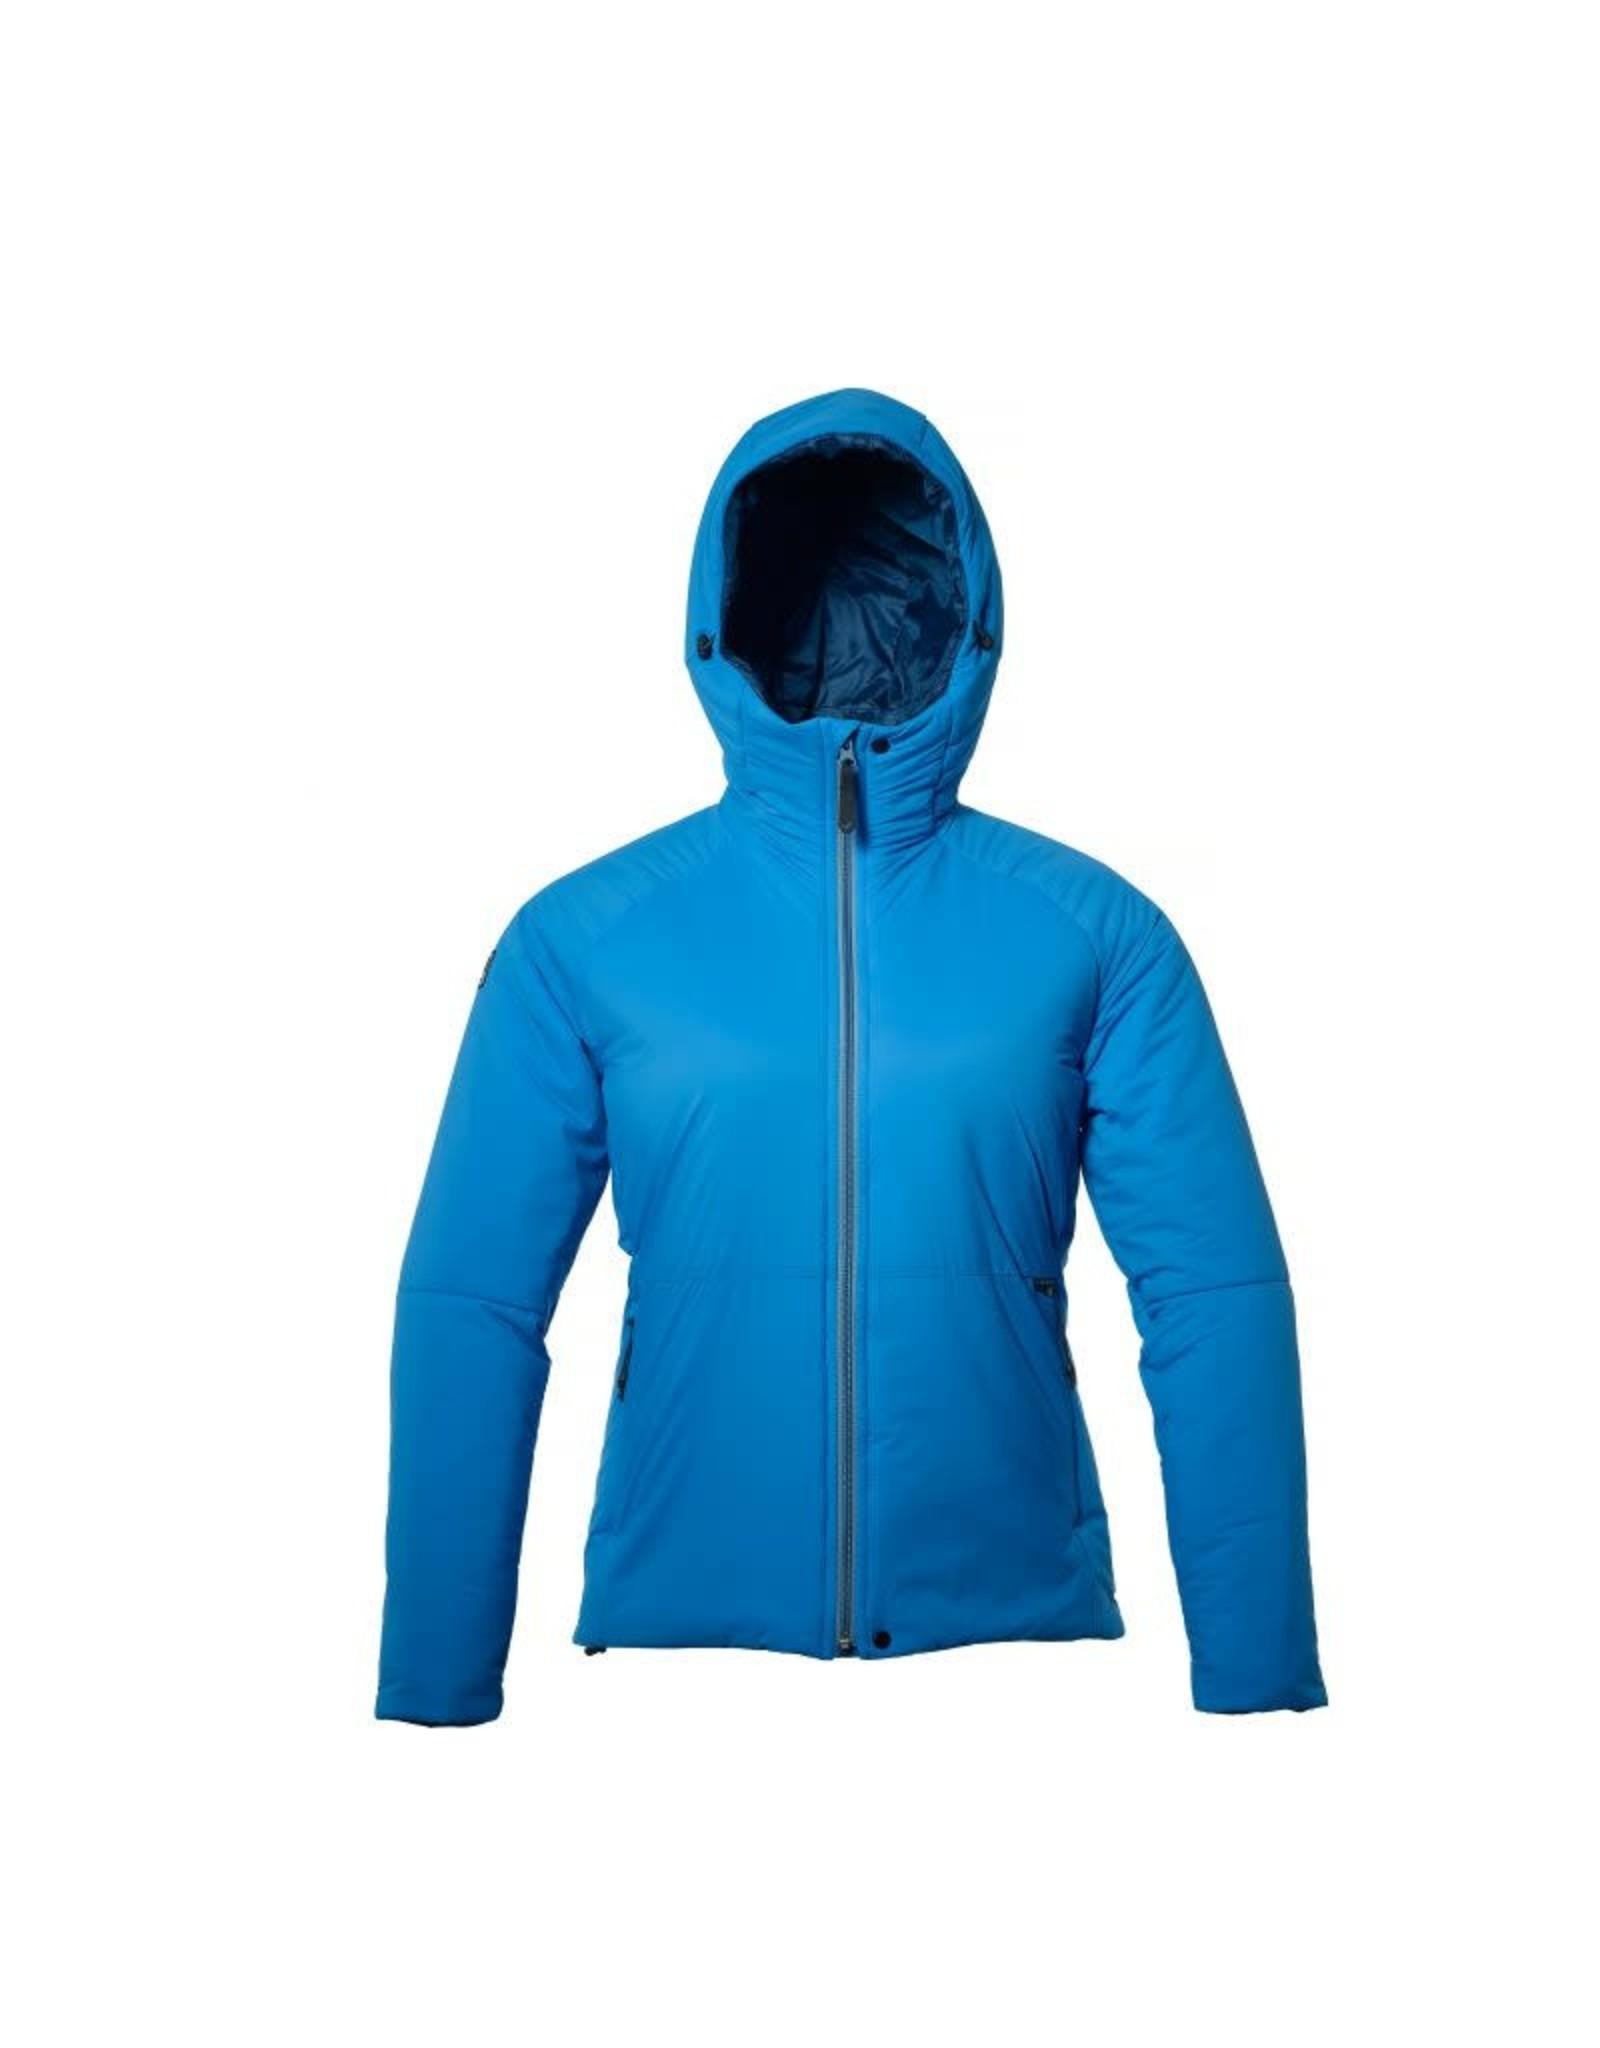 LOOP Womens Onka Jacket - Water Blue, Small